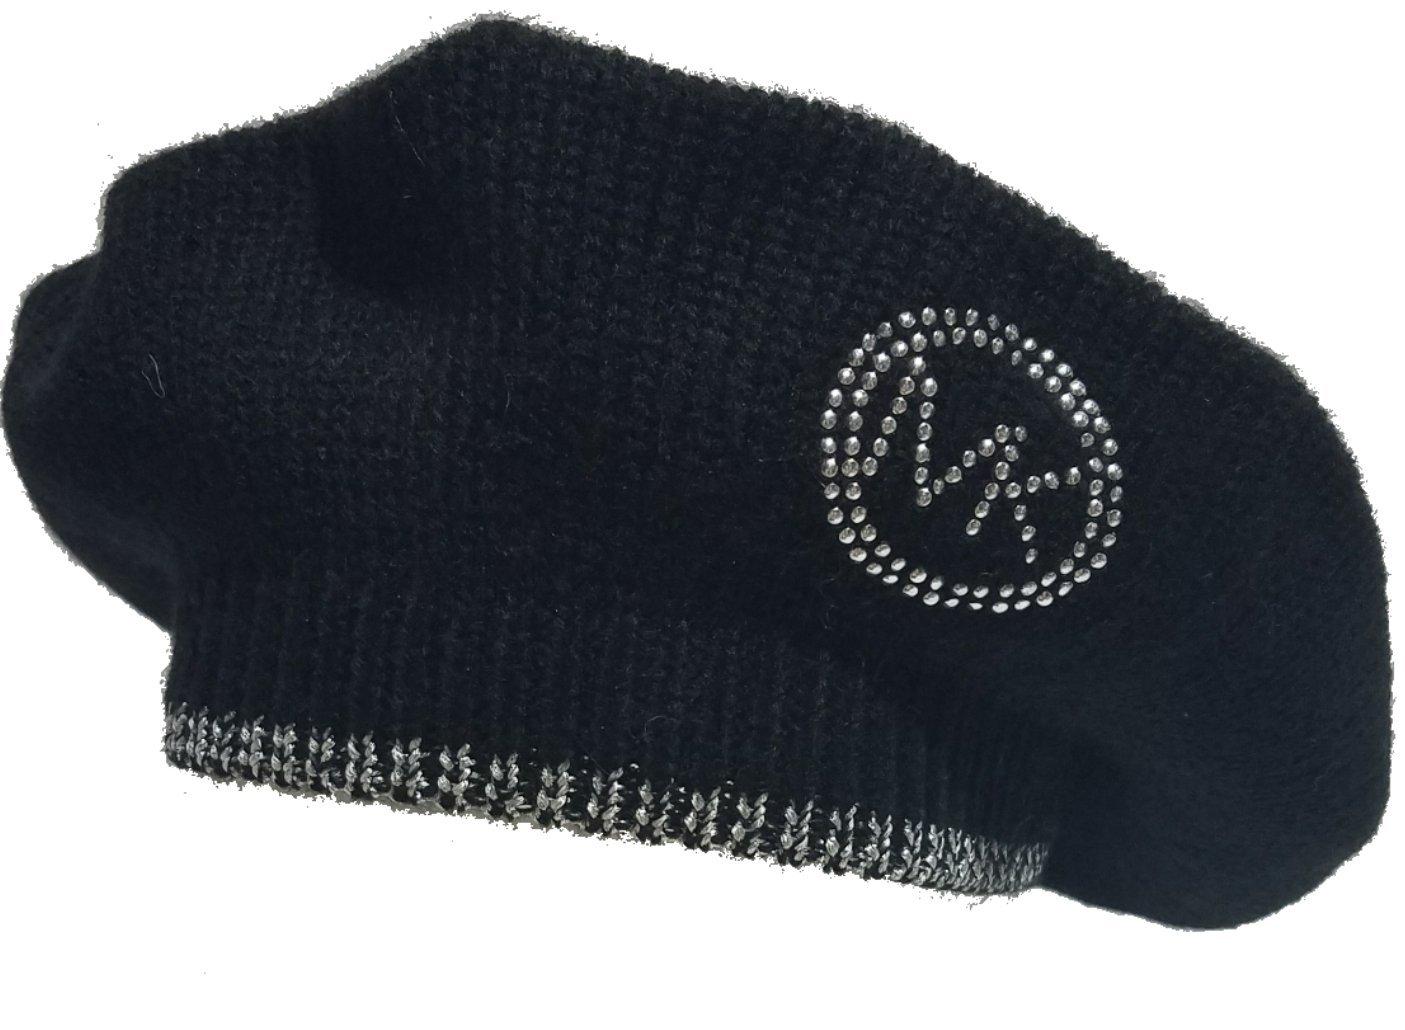 Michael Kors MK Silver Logo Beret, Black